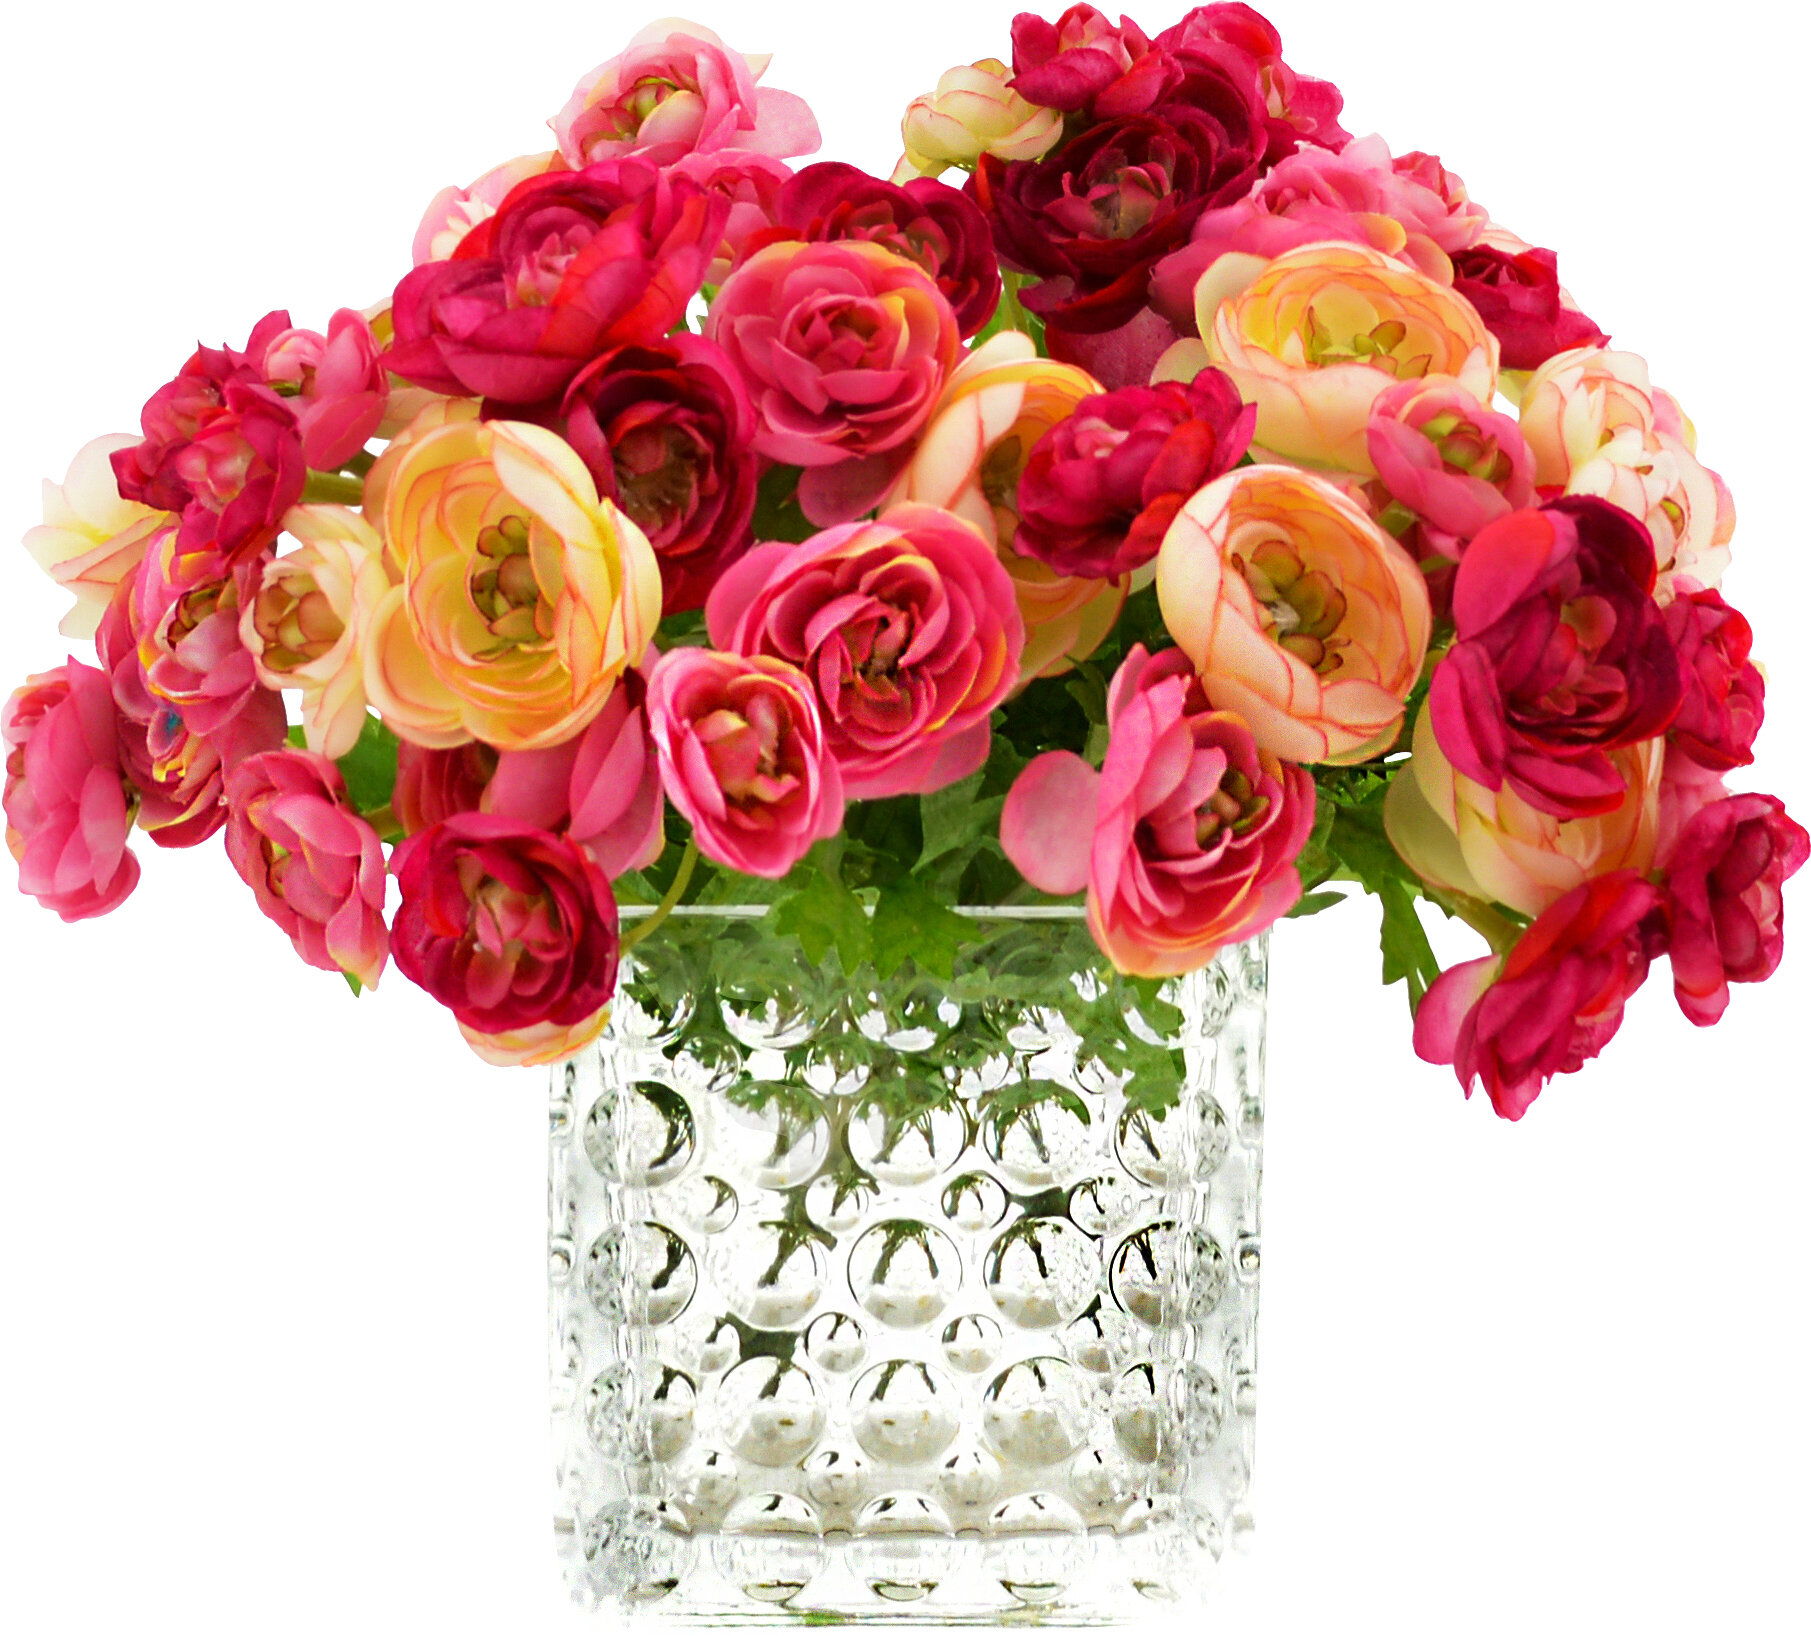 Ranunculus Red Flower Arrangements You Ll Love In 2021 Wayfair